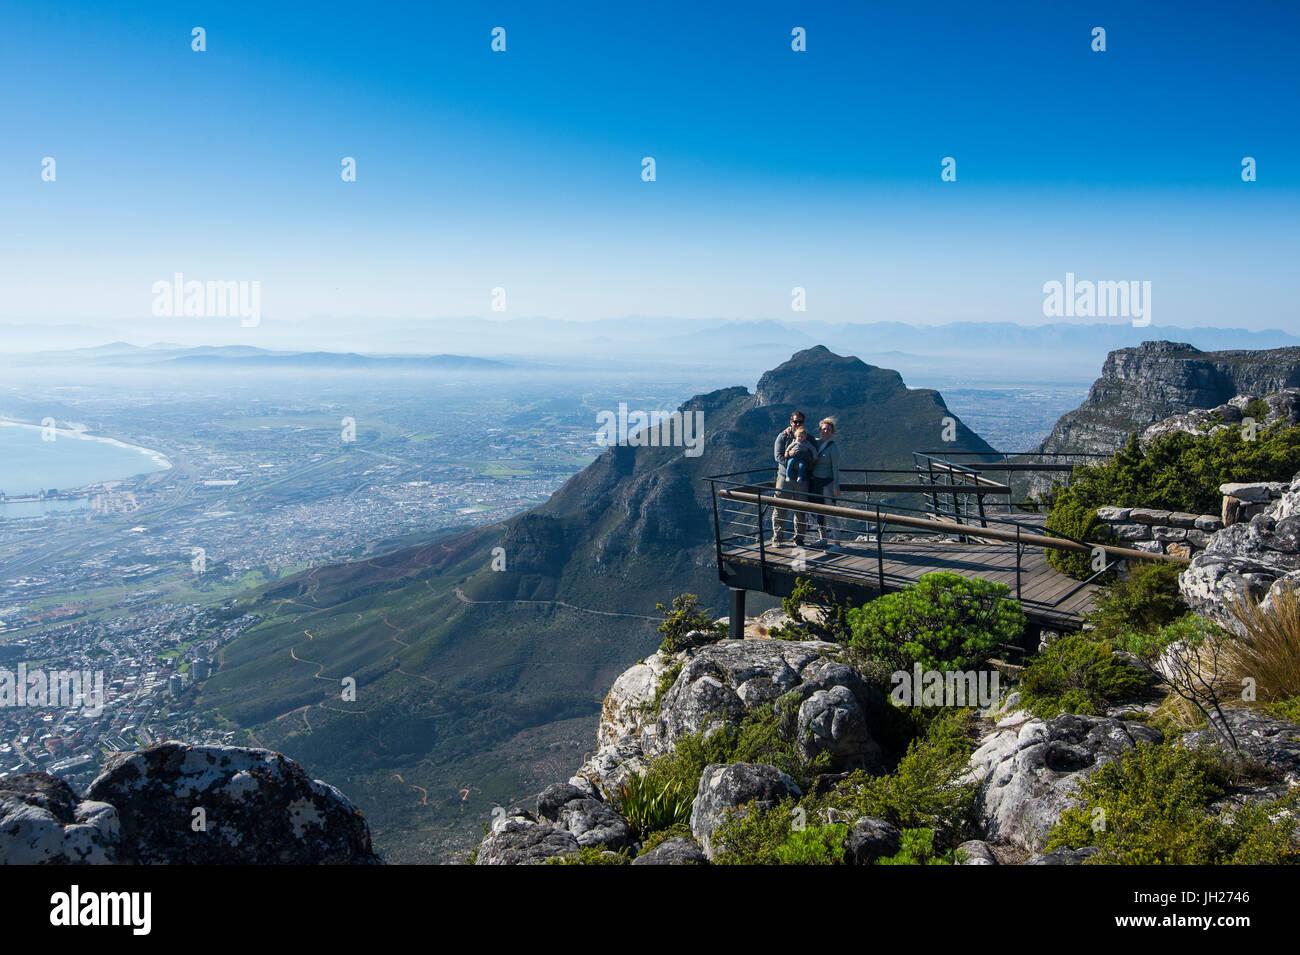 Familia disfrutando de las vistas de Table Mountain en Cape Town, Sudáfrica, África Imagen De Stock